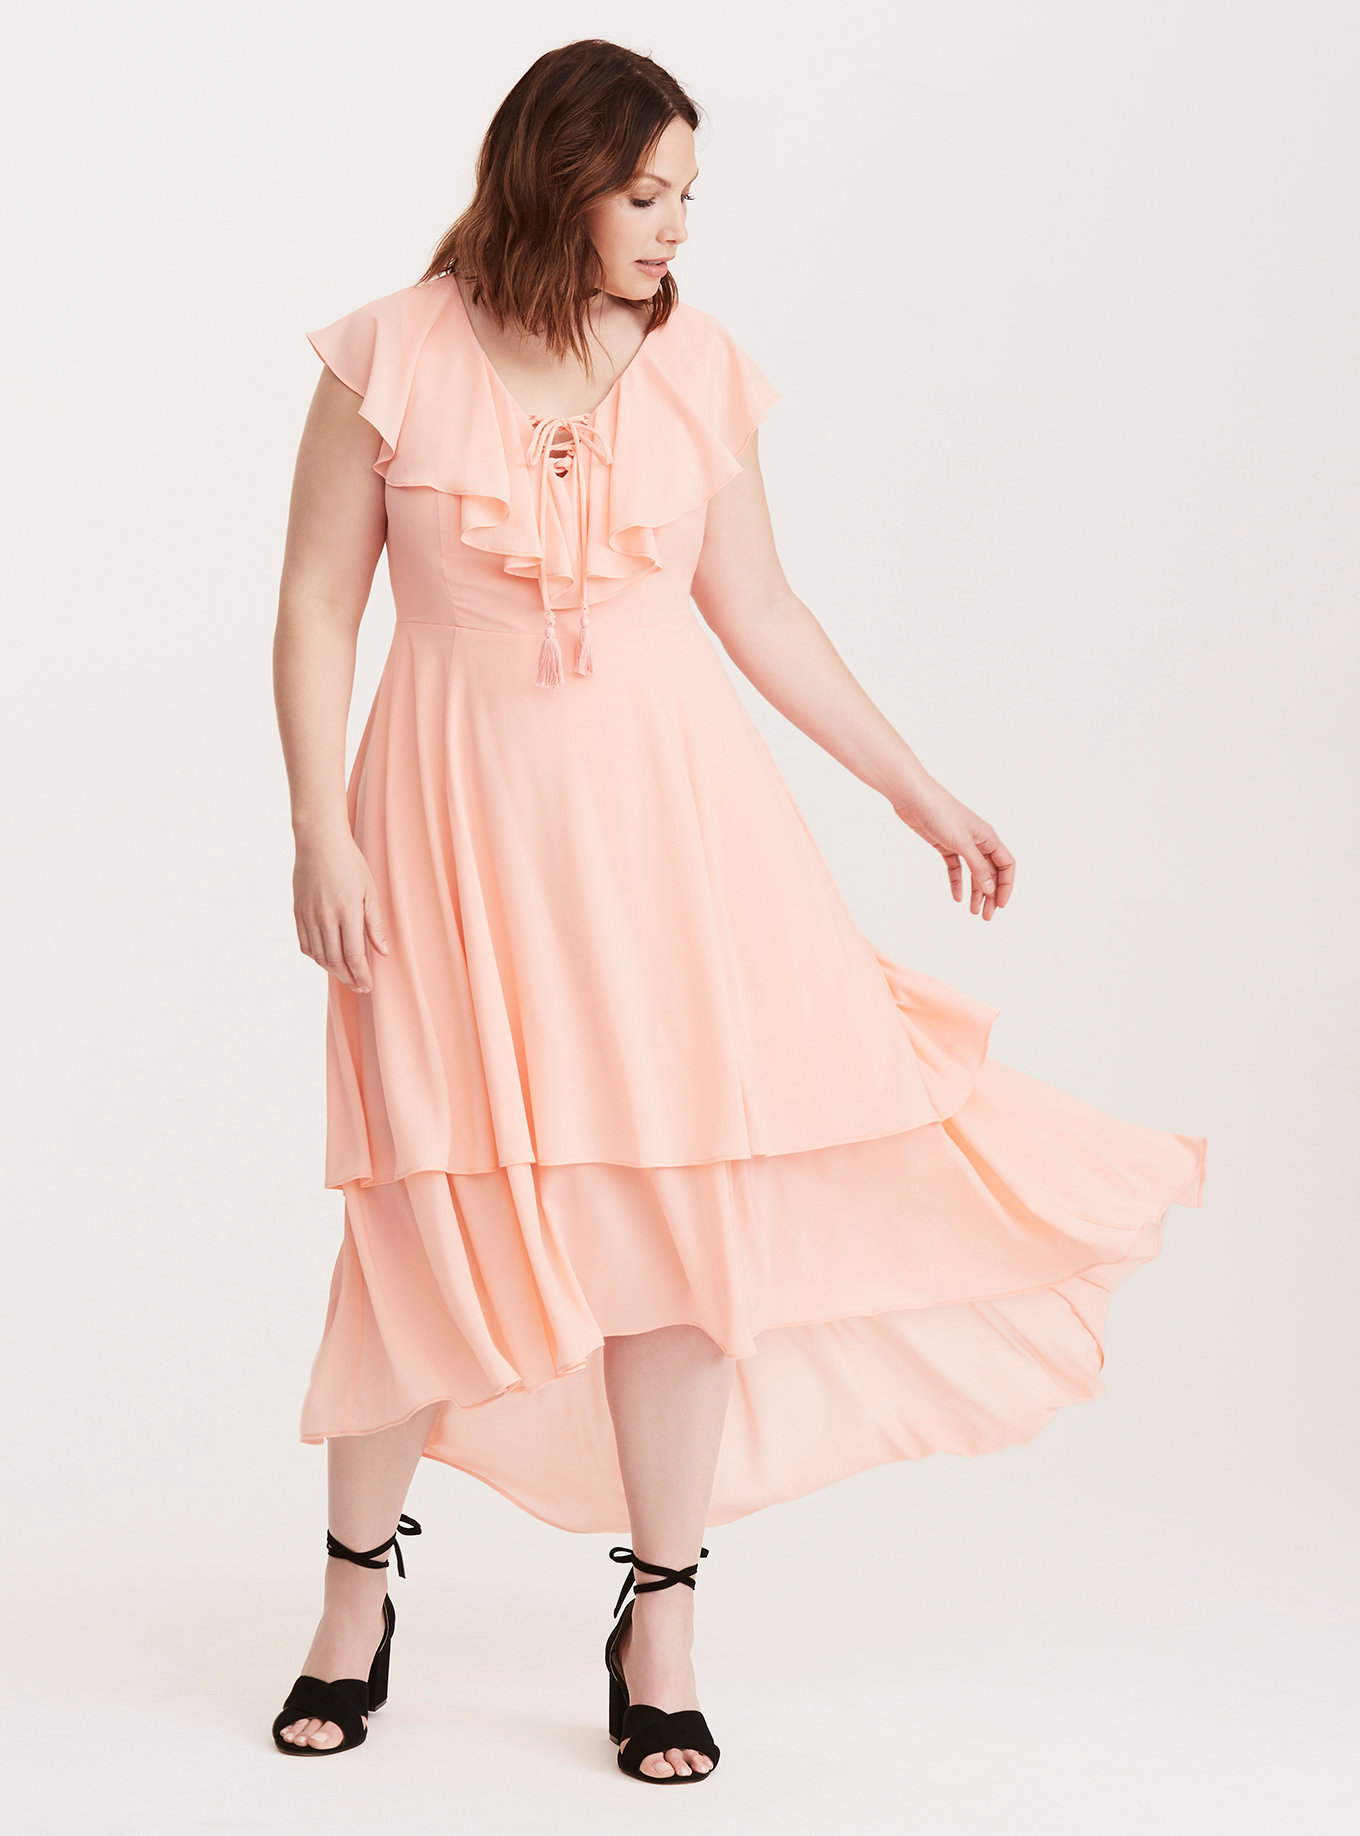 Torrid Insider Lace Up Ruffle Maxi Dress